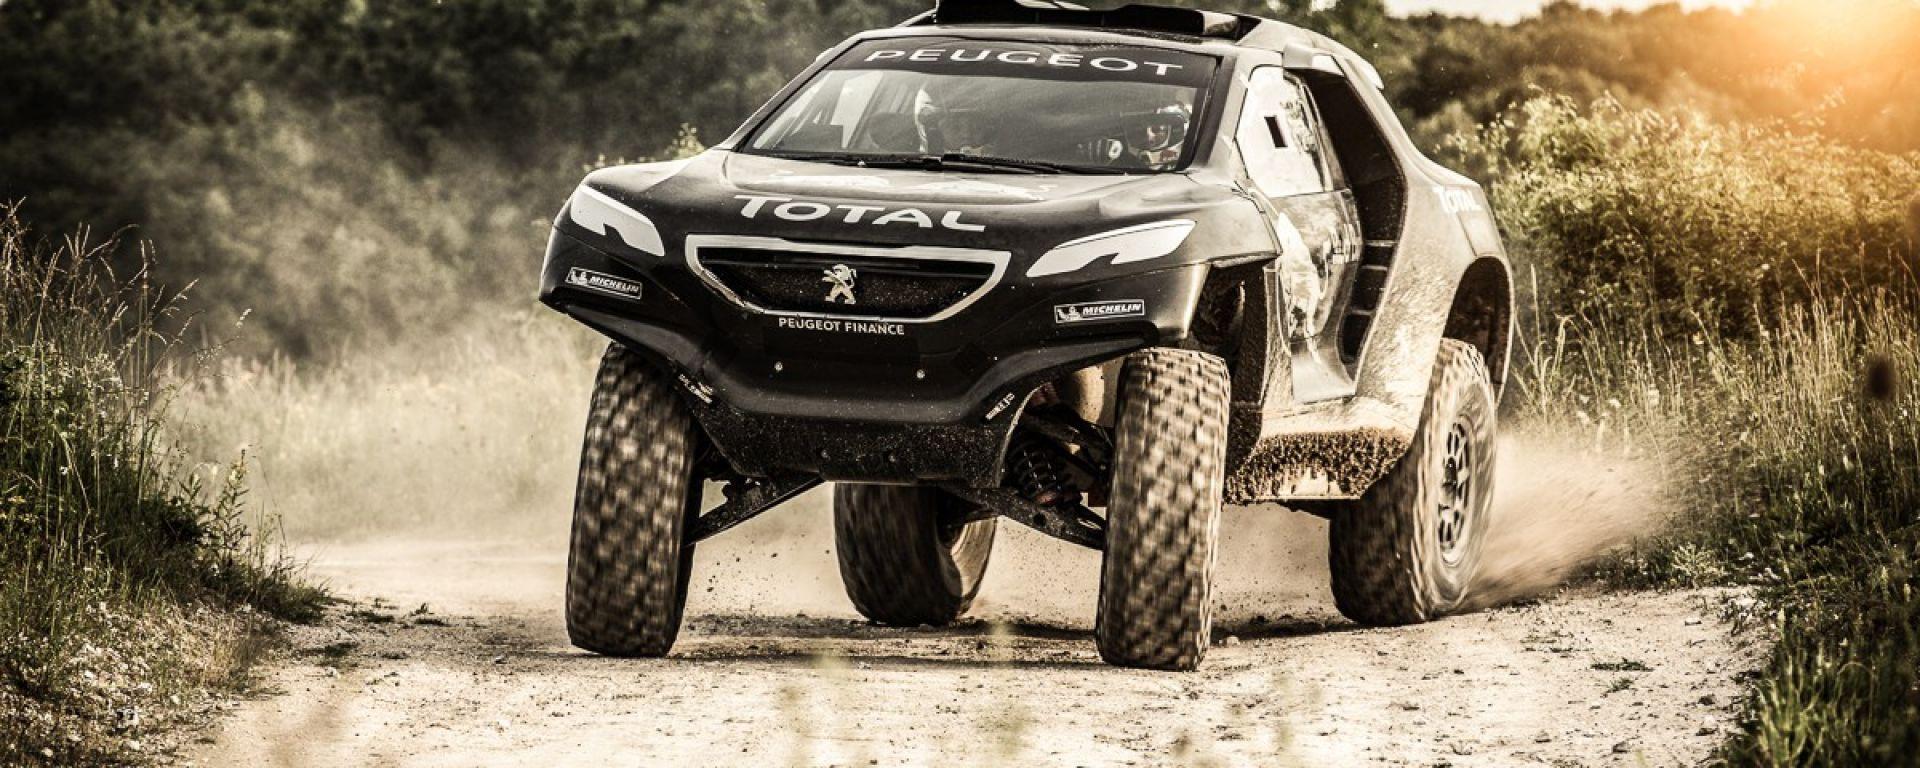 Peugeot 2008 DKR, nuove foto e info